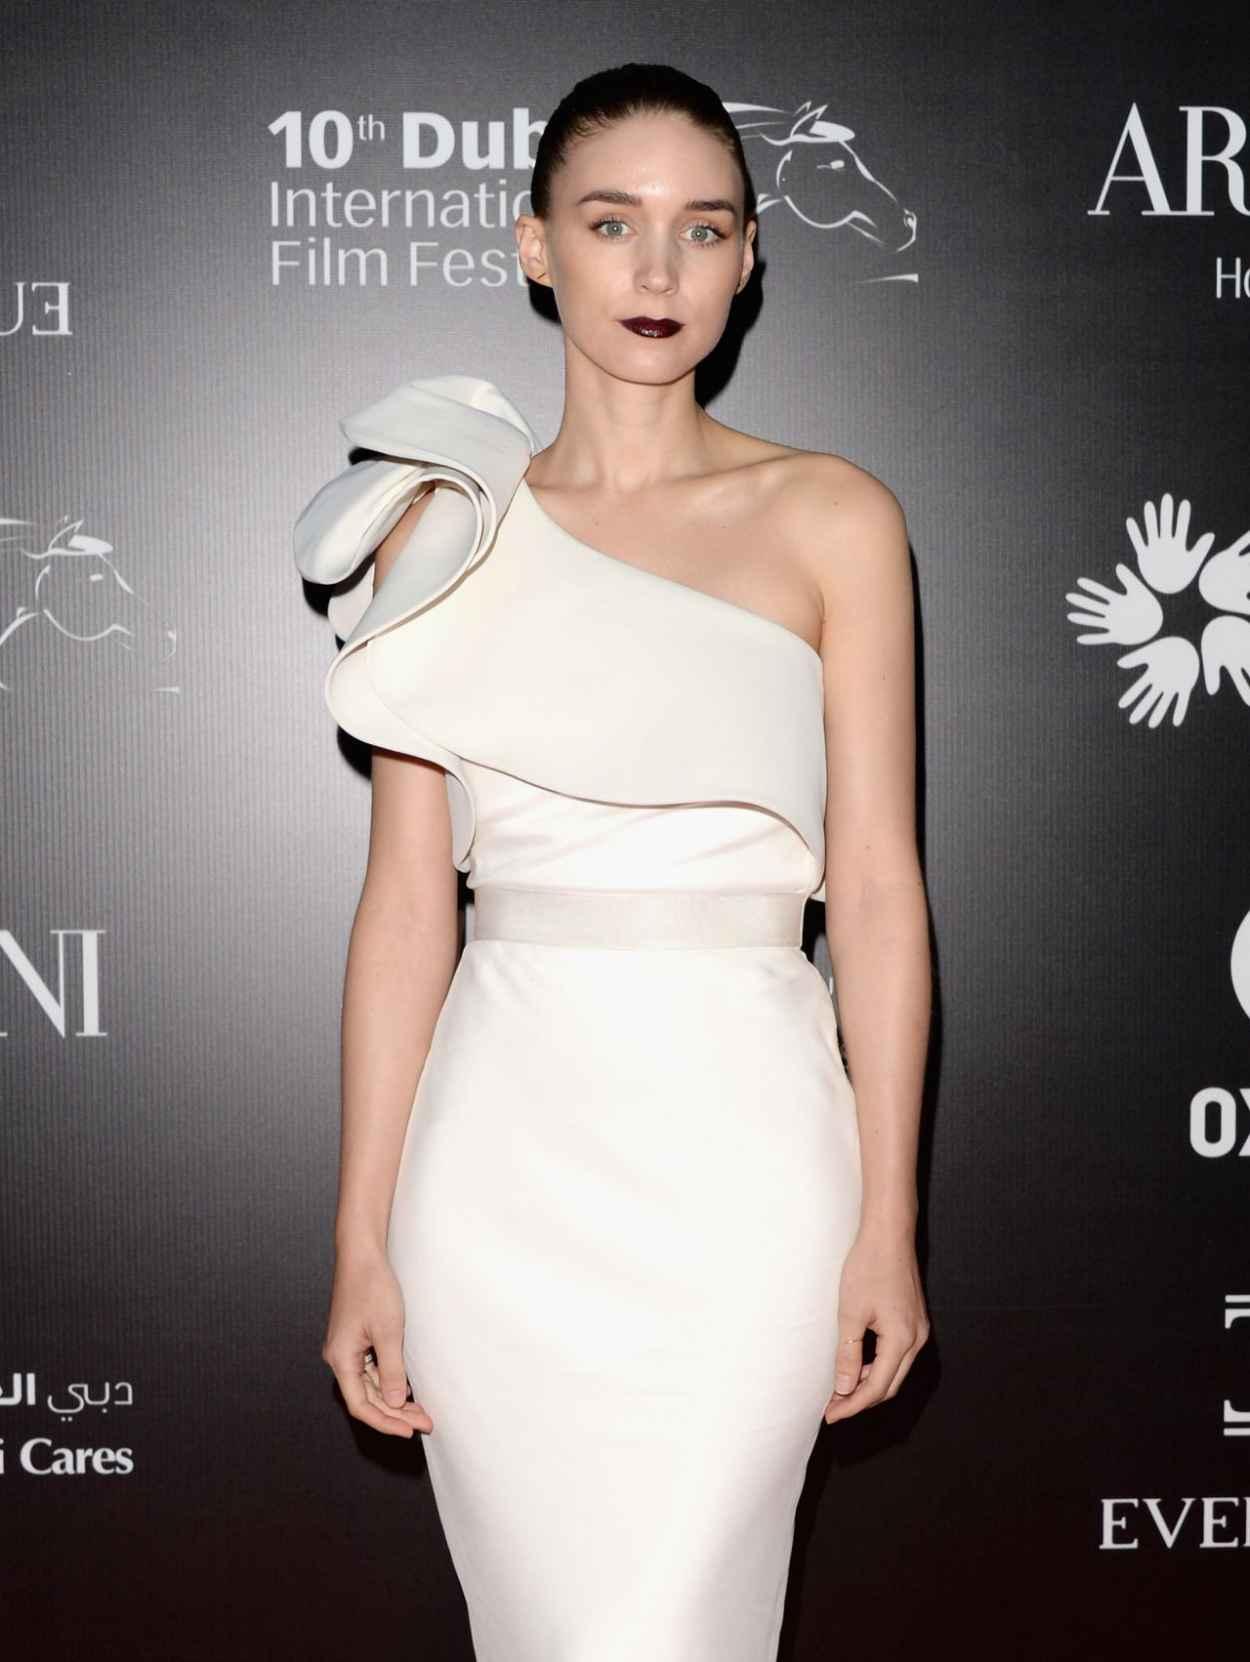 Rooney Mara at Oxfam Charity Gala 10th Dubai Film Festival - Dec. 2015-1